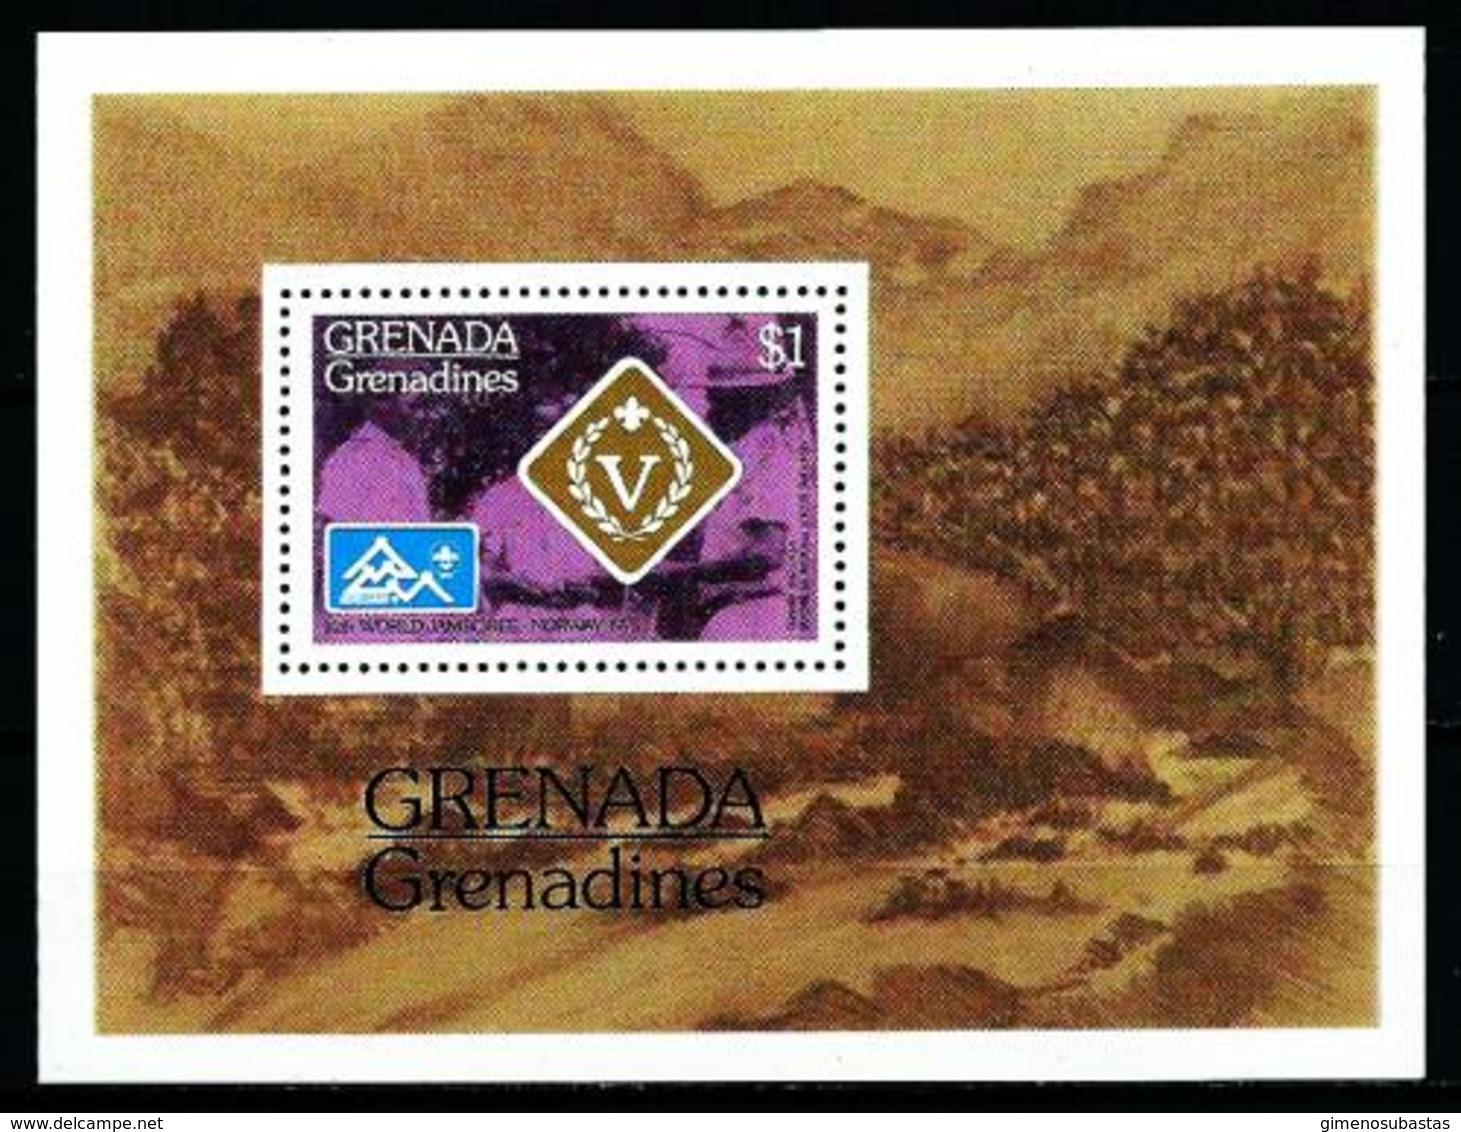 Granadinas (Grenada) Nº HB-13 Nuevo - Grenada (1974-...)